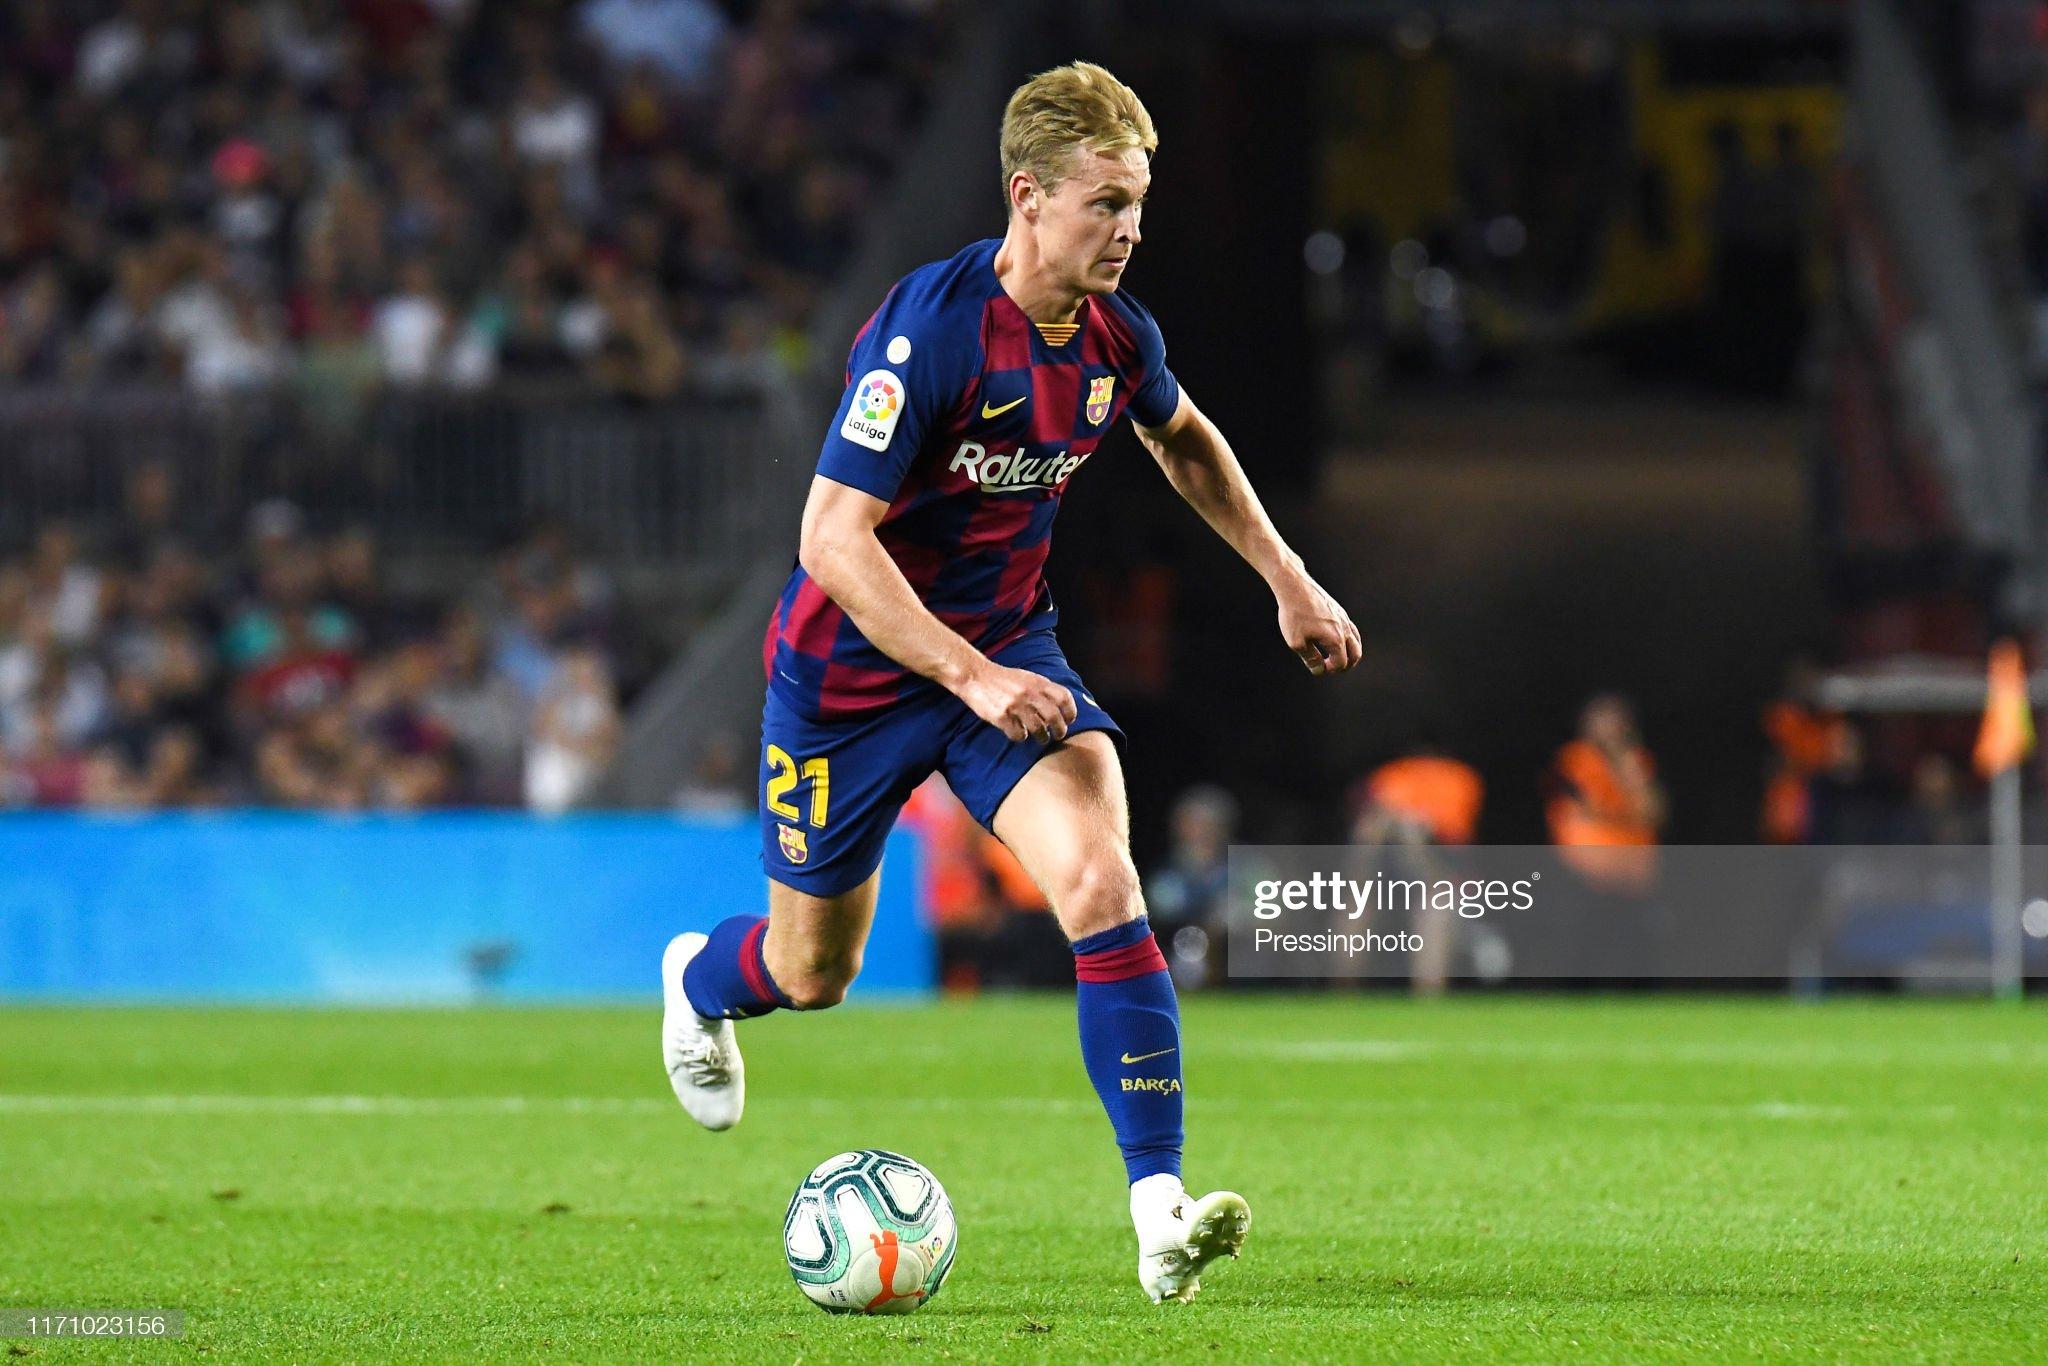 صور مباراة : برشلونة - فياريال 2-1 ( 24-09-2019 )  Frenkie-de-jong-of-fc-barcelona-during-the-liga-match-between-and-picture-id1171023156?s=2048x2048